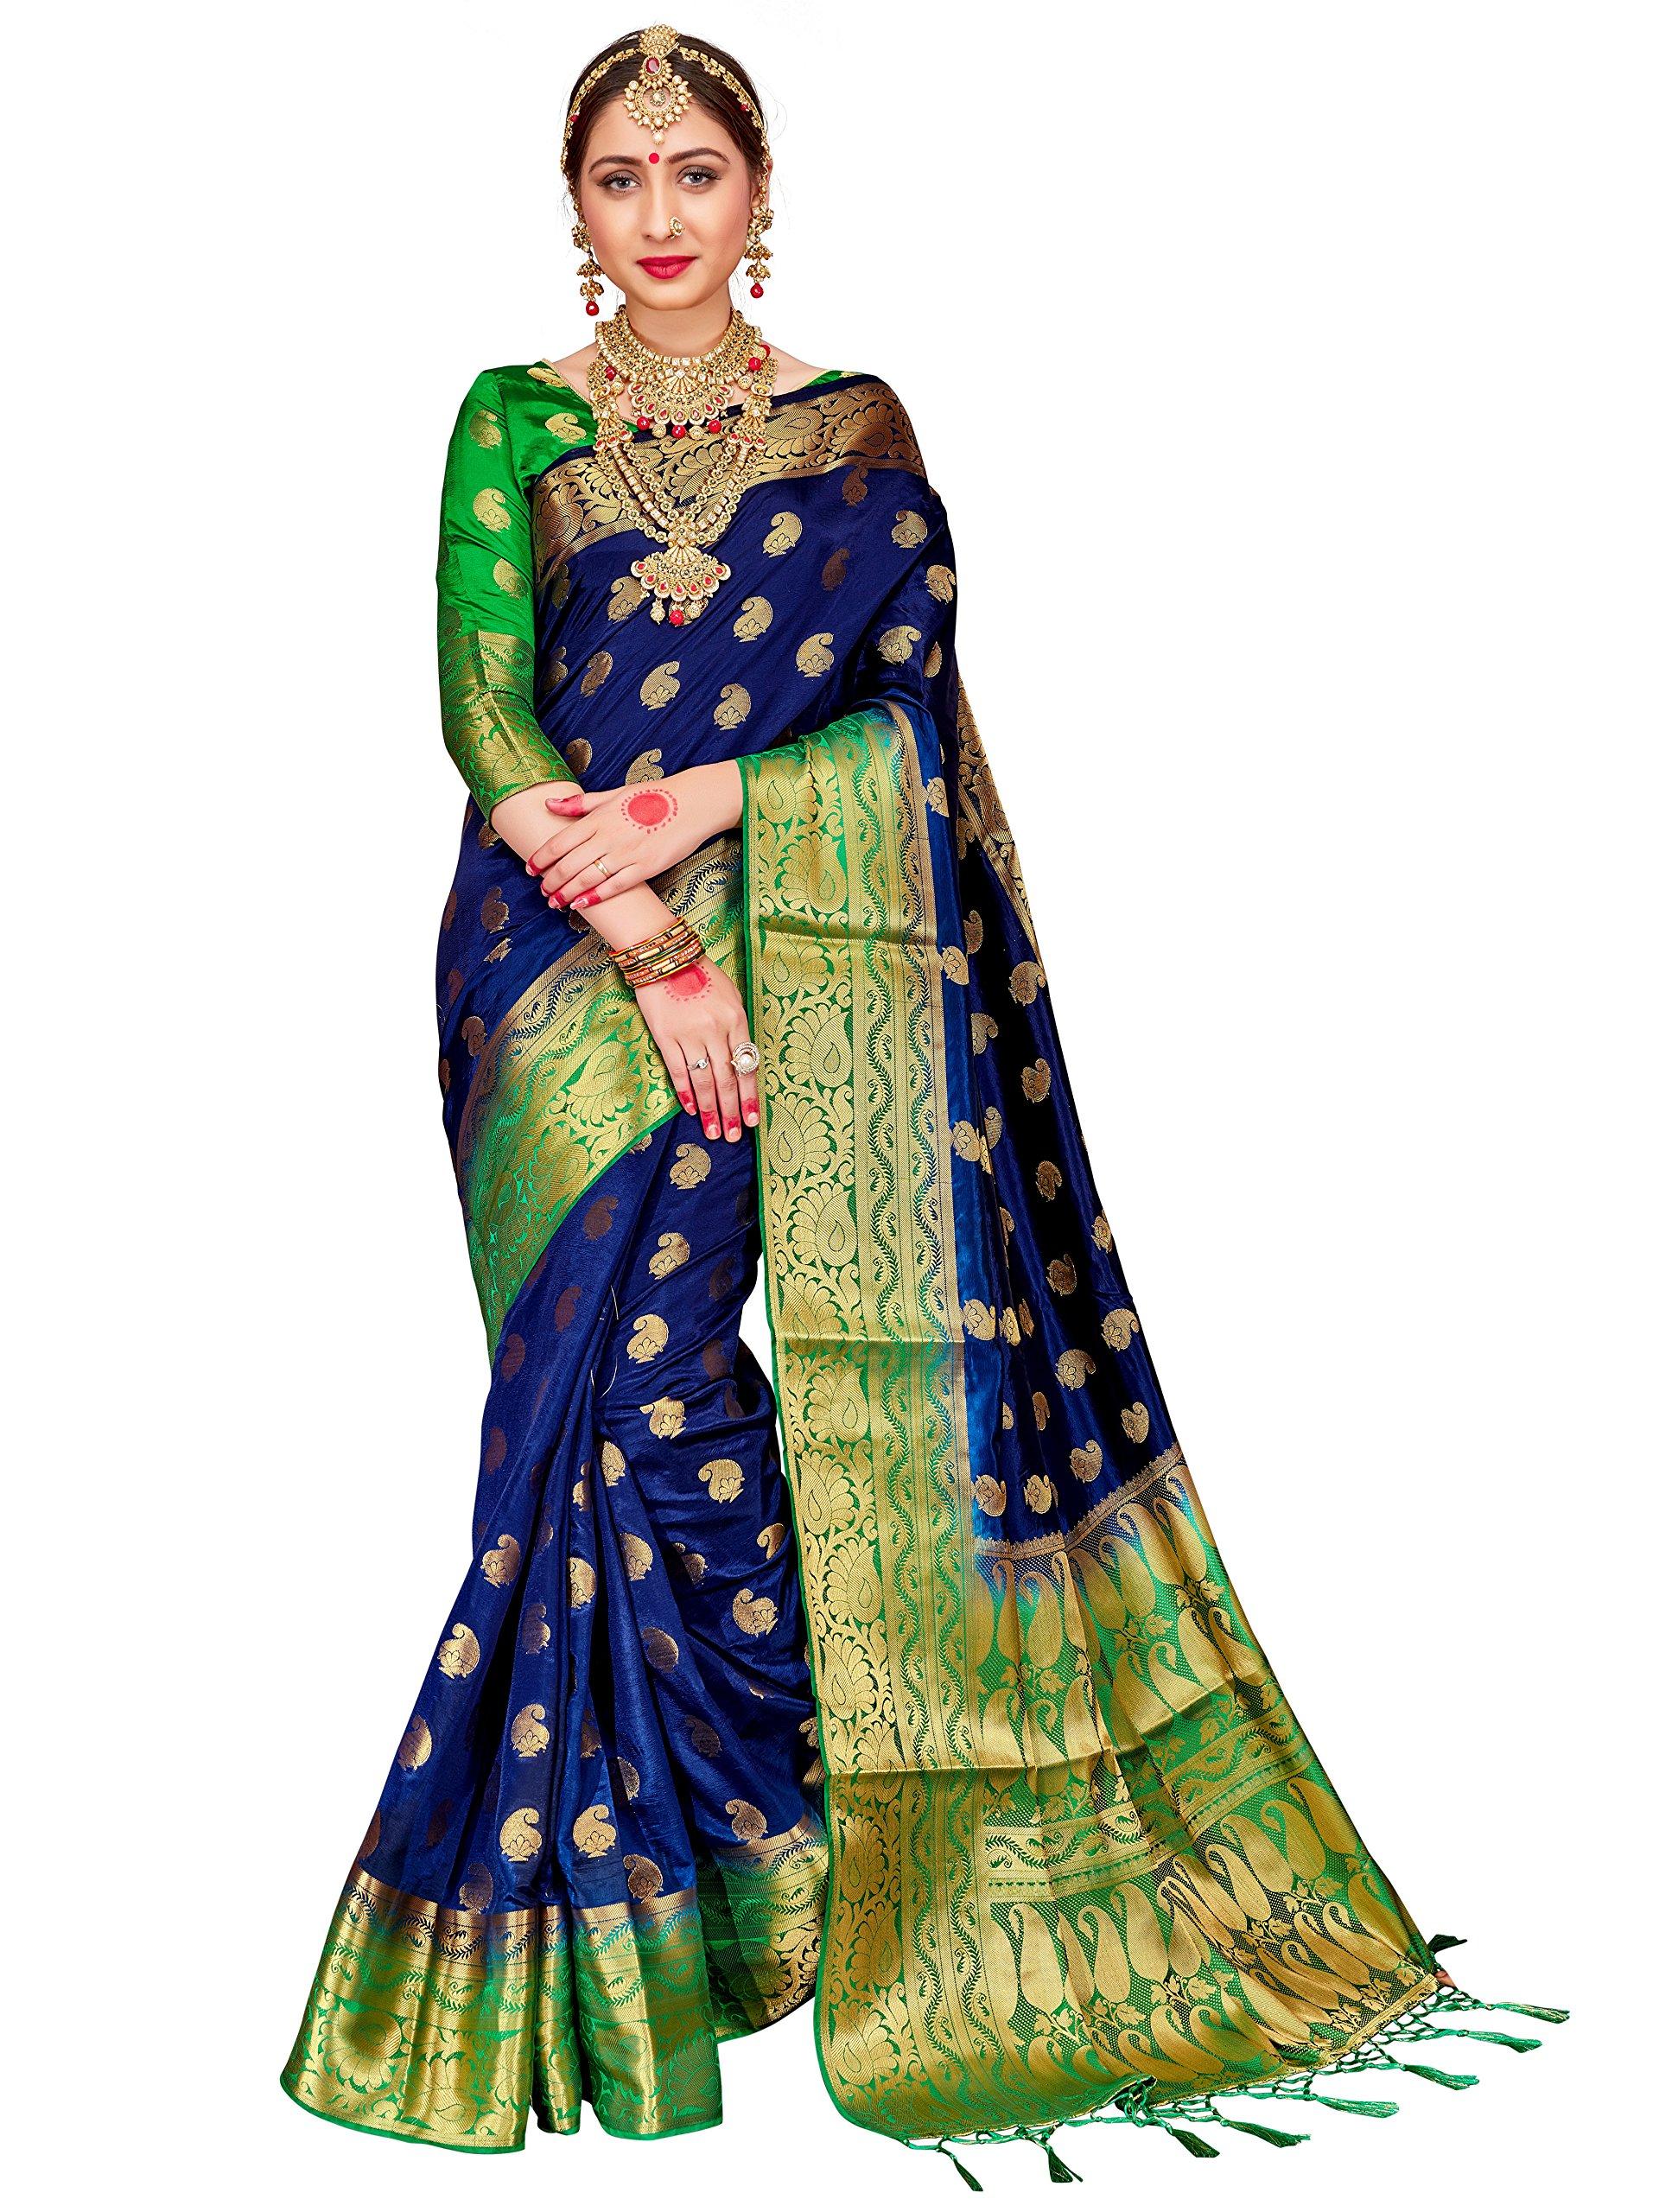 ELINA FASHION Sarees for Women Banarasi Art Silk Woven Work Saree l Indian Wedding Ethnic Wear Sari & Blouse Piece (Navy Blue)